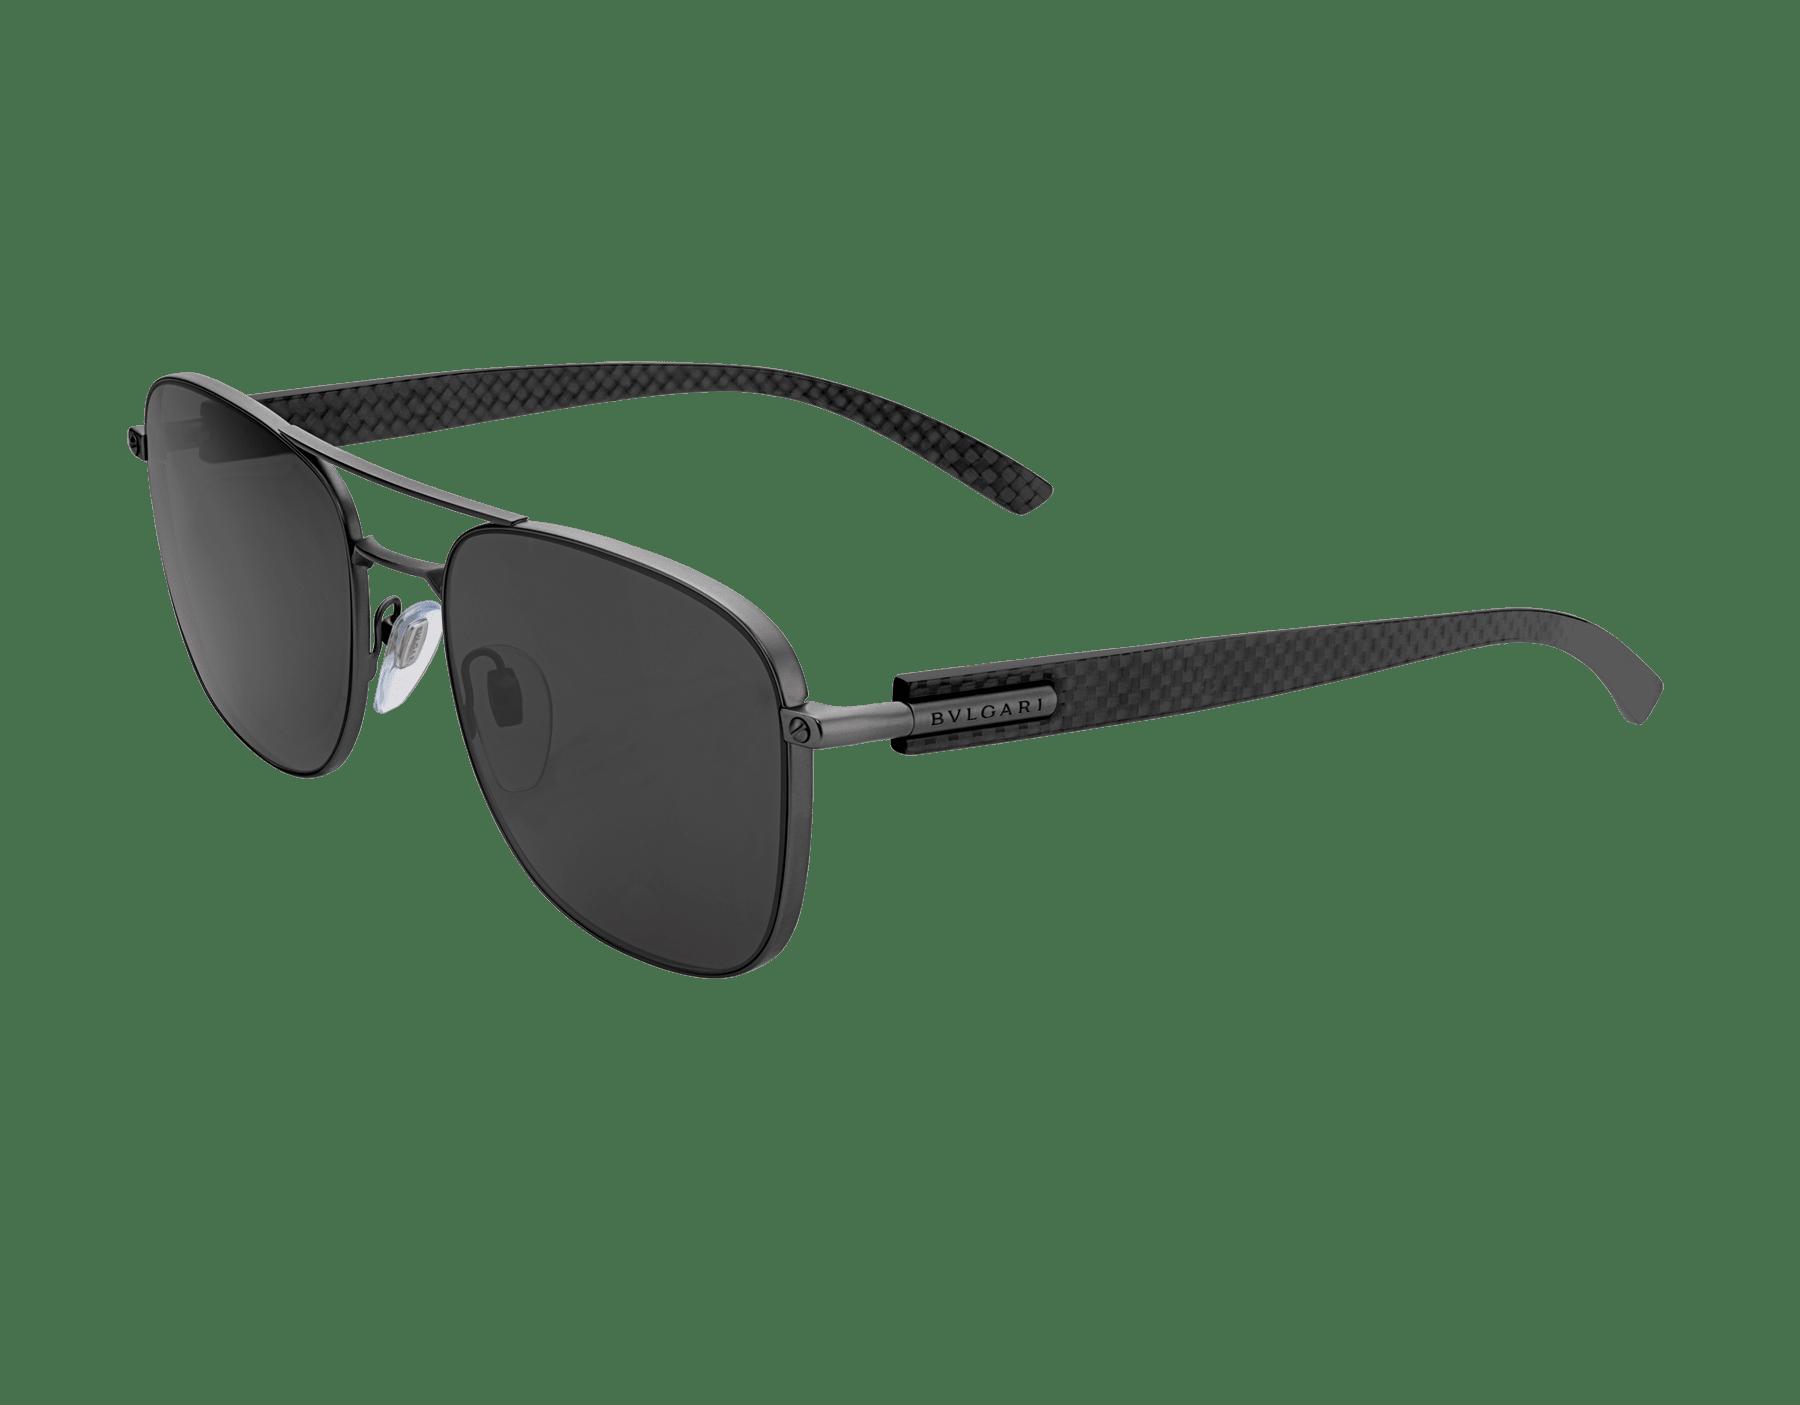 Bulgari Diagono rectangular metal sunglasses with metal double bridge and carbon fibre arms. 903911 image 1